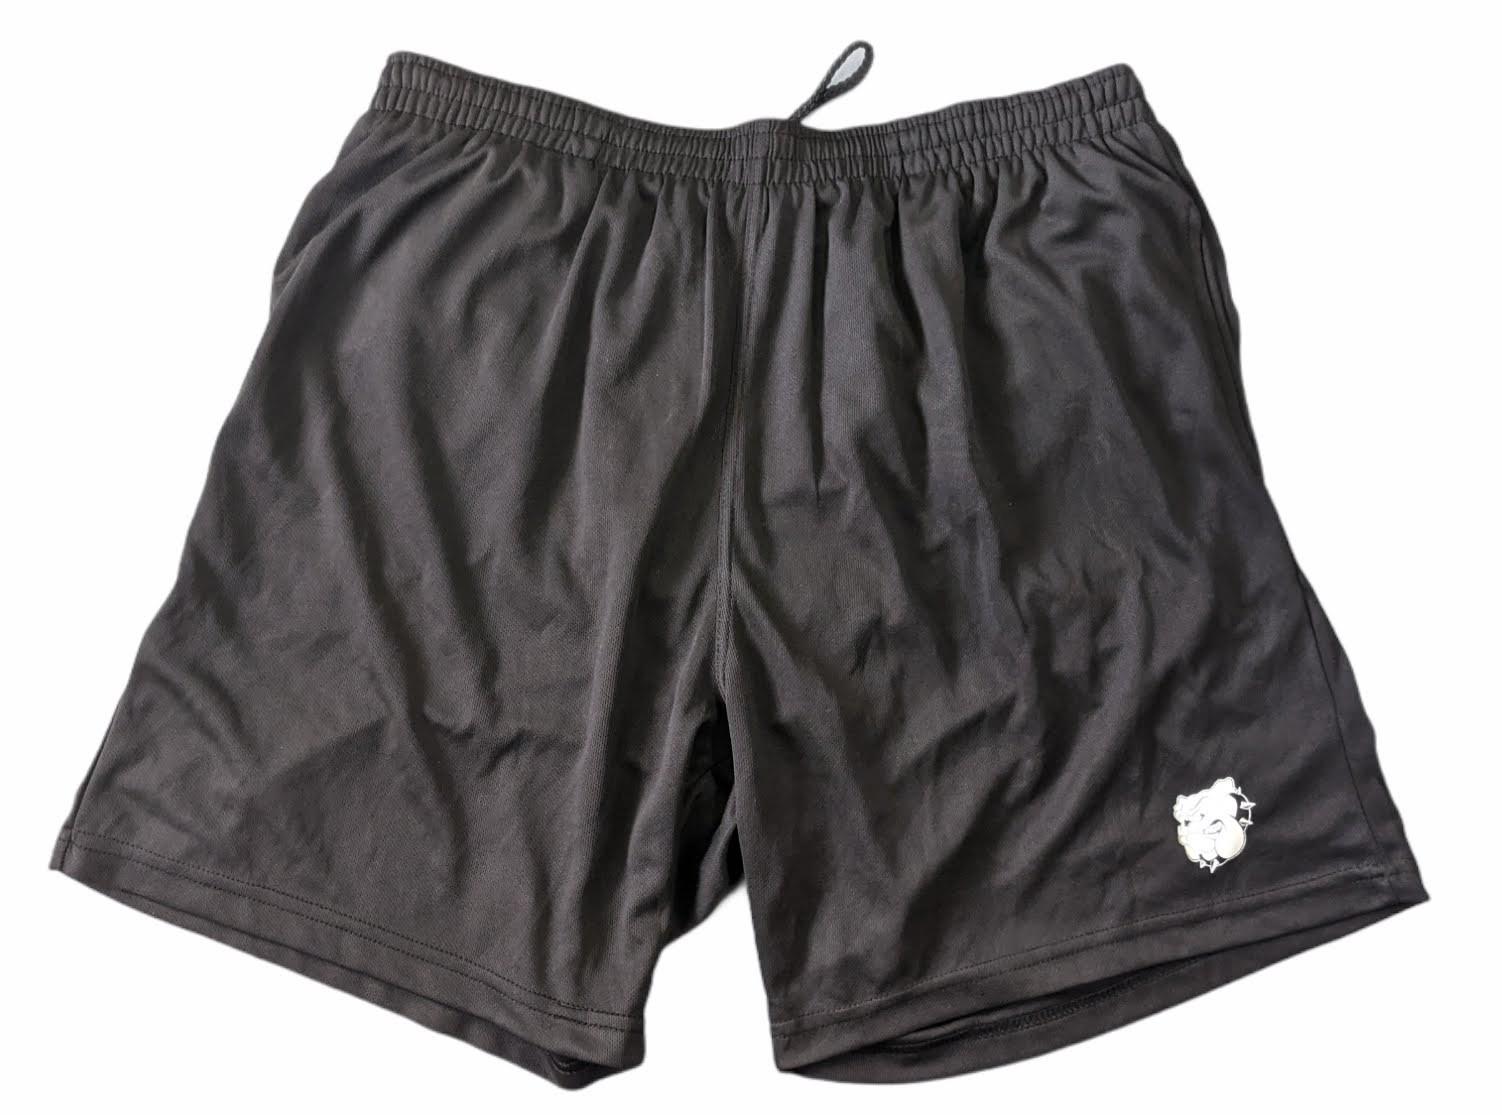 Contra streetwear bulldog - summer shorts black (last sizes)